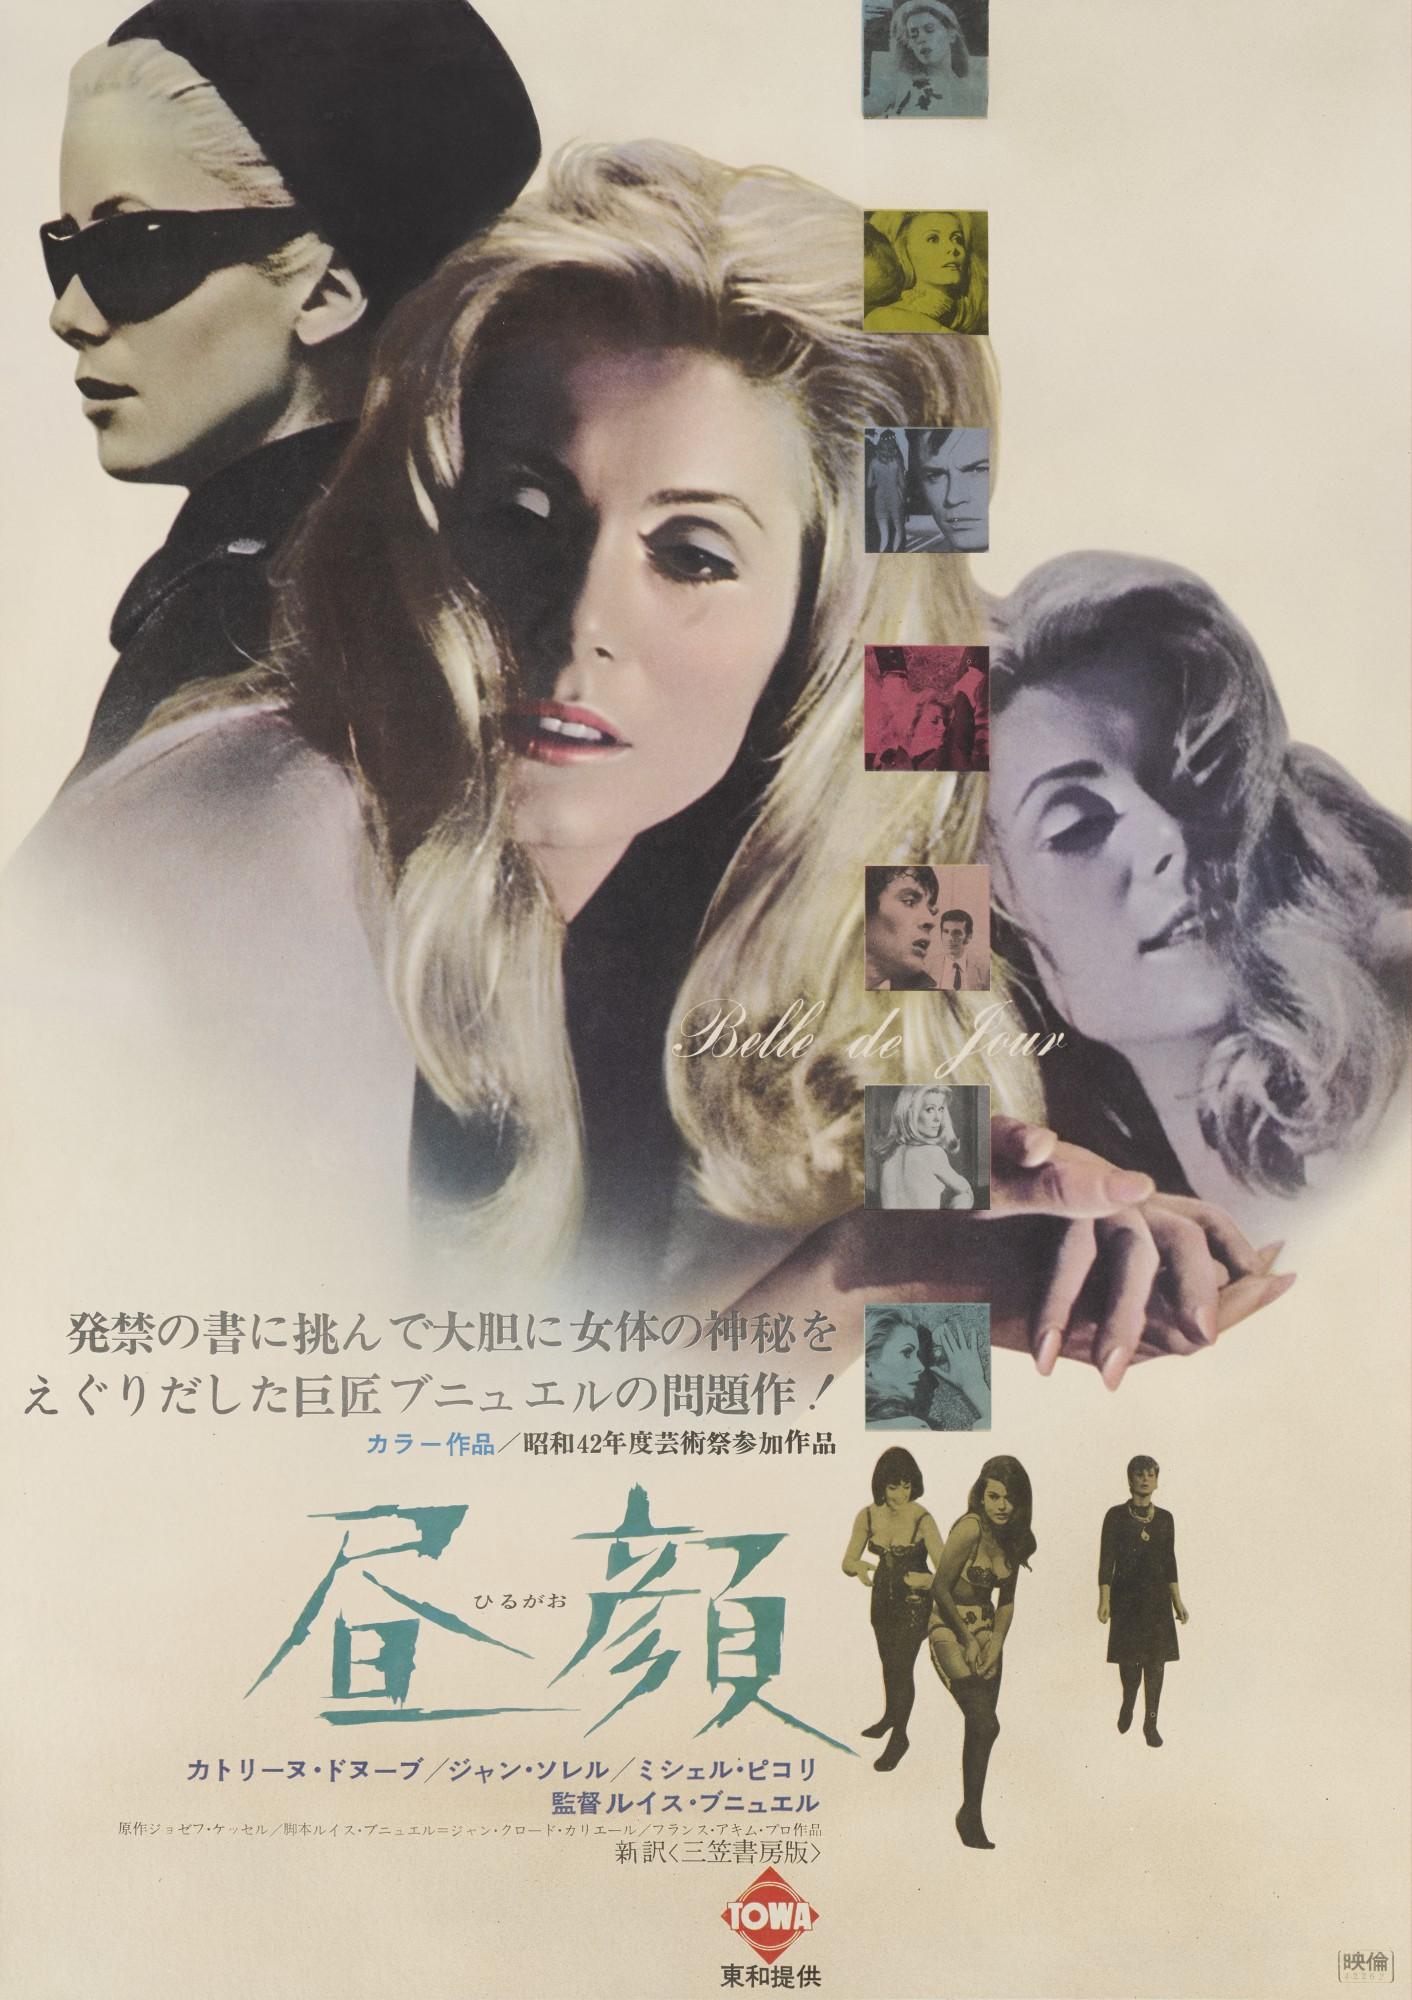 BELLE DE JOUR (1967) POSTER, JAPANESE